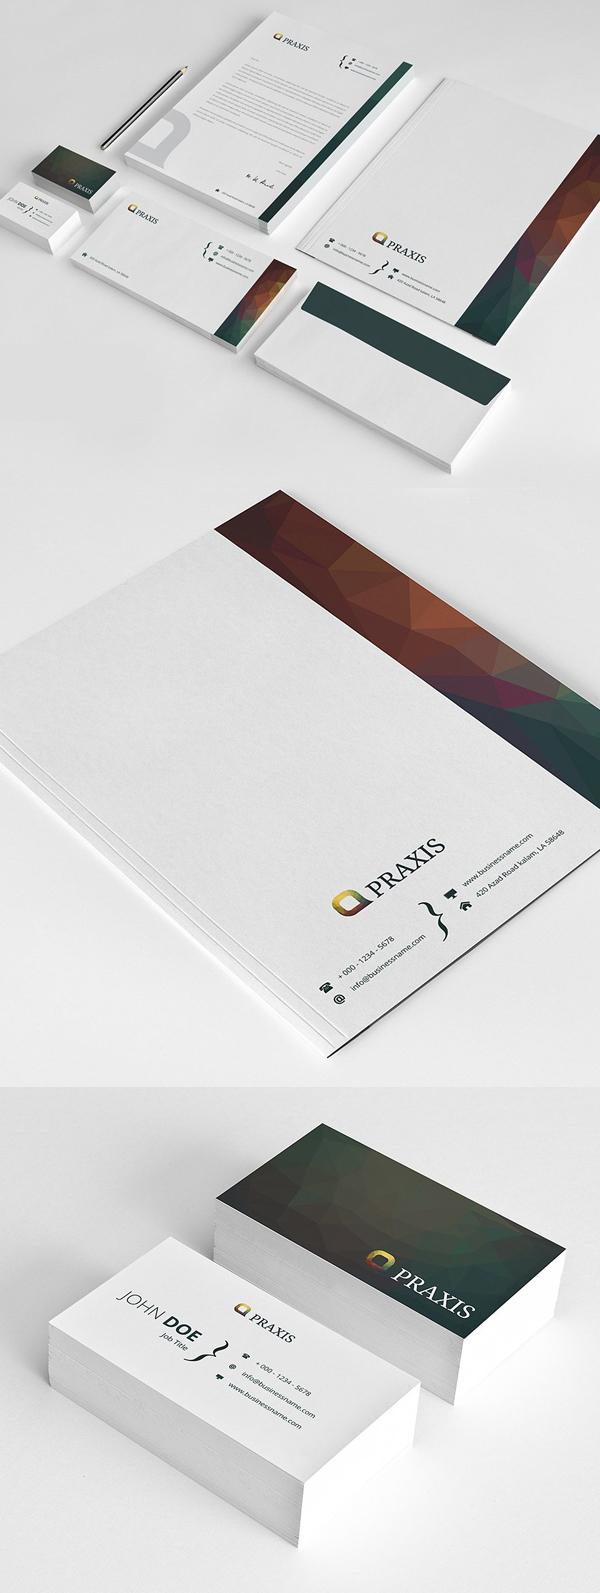 50 Professional Corporate Branding / Stationery Templates Design - 8